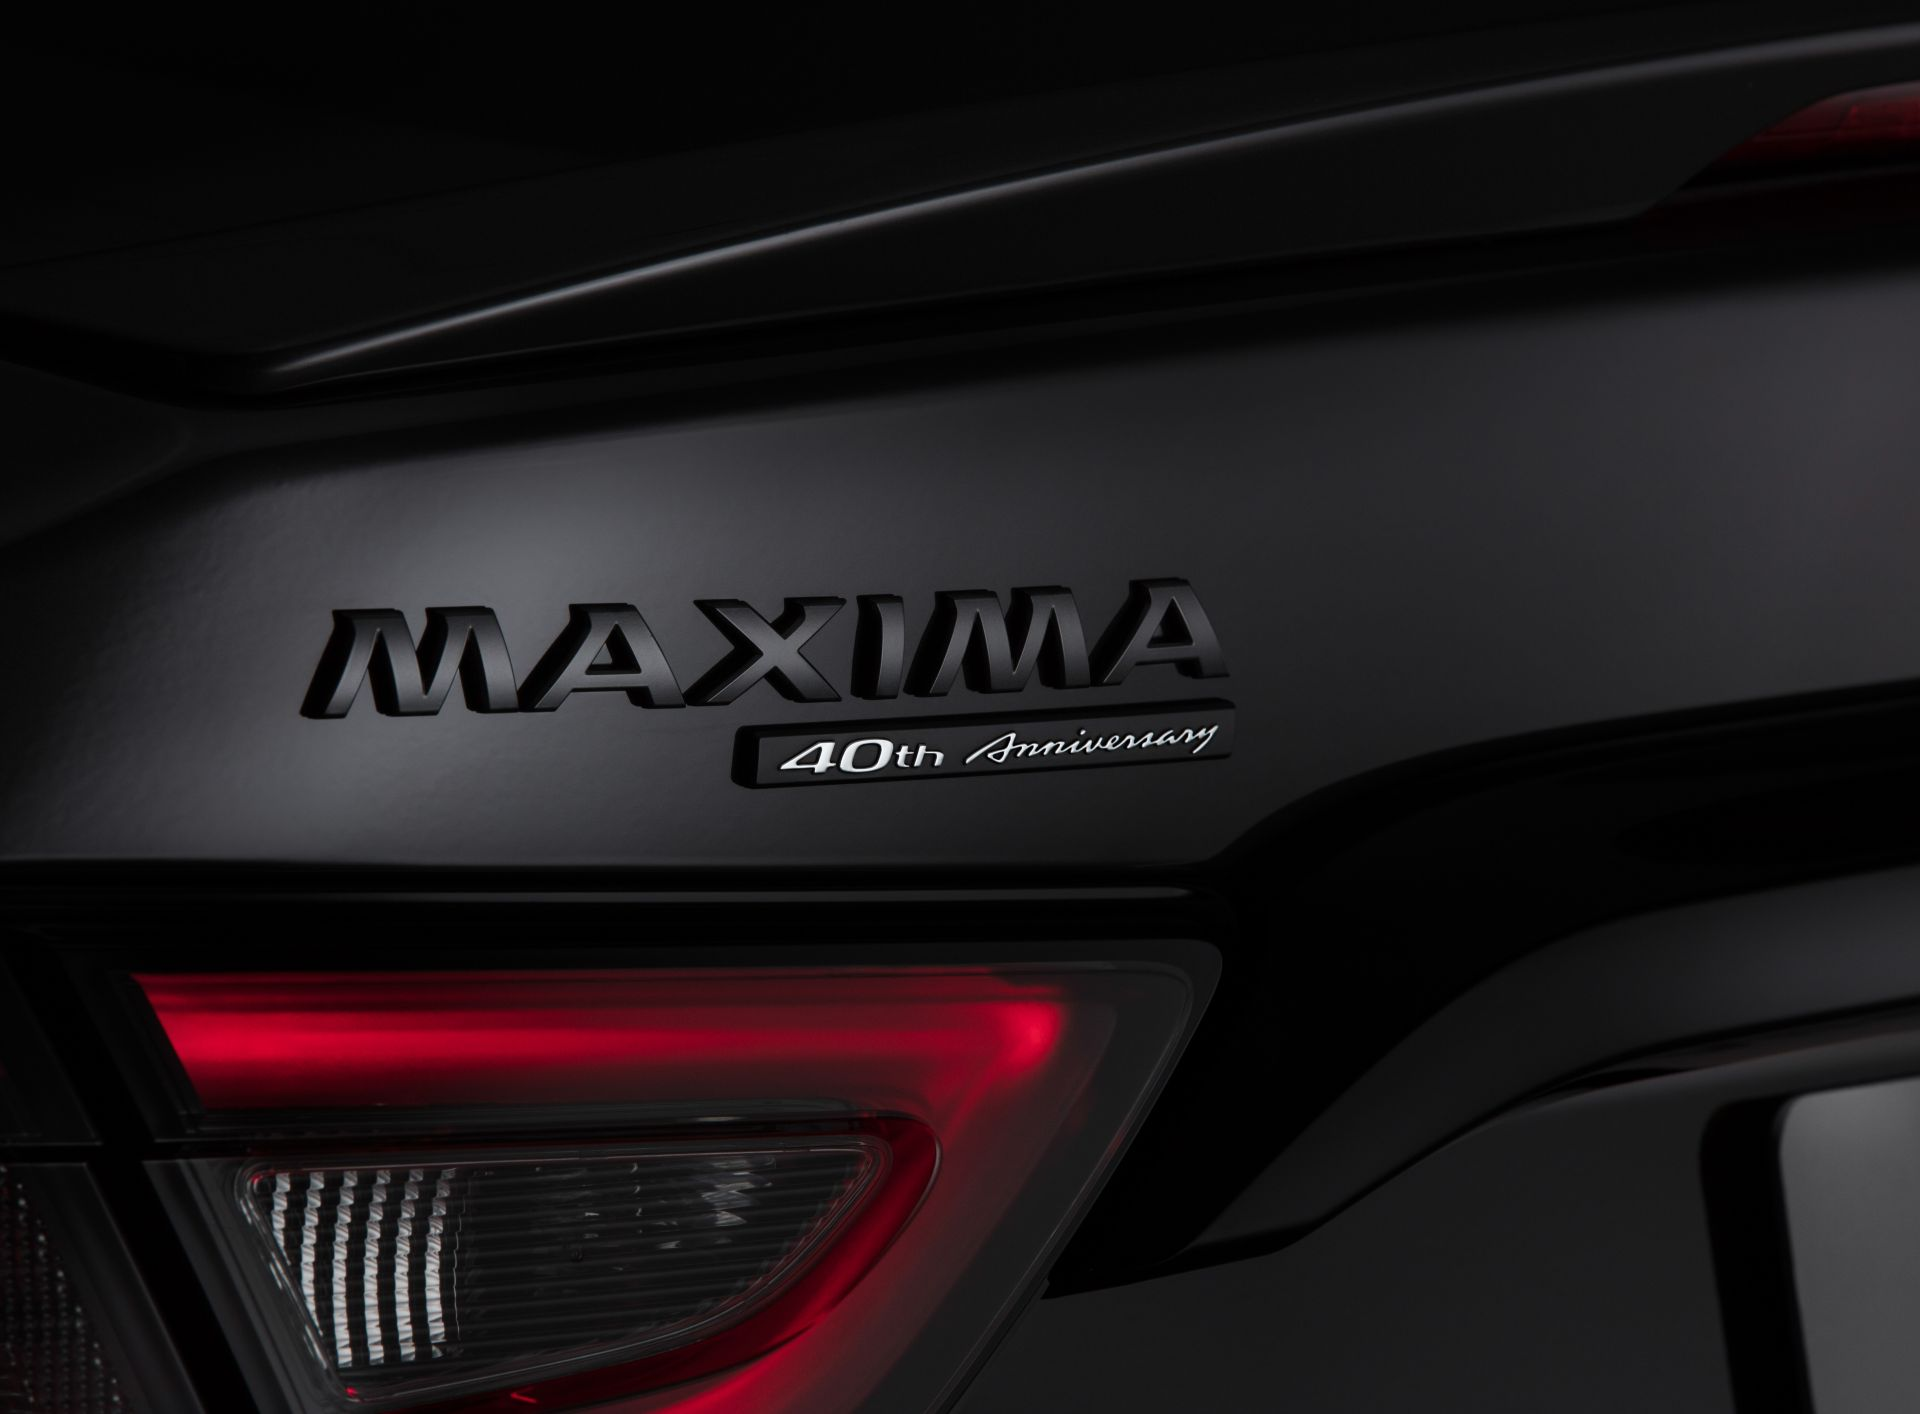 Nissan-Maxima-40th-Anniversary-Edition-20